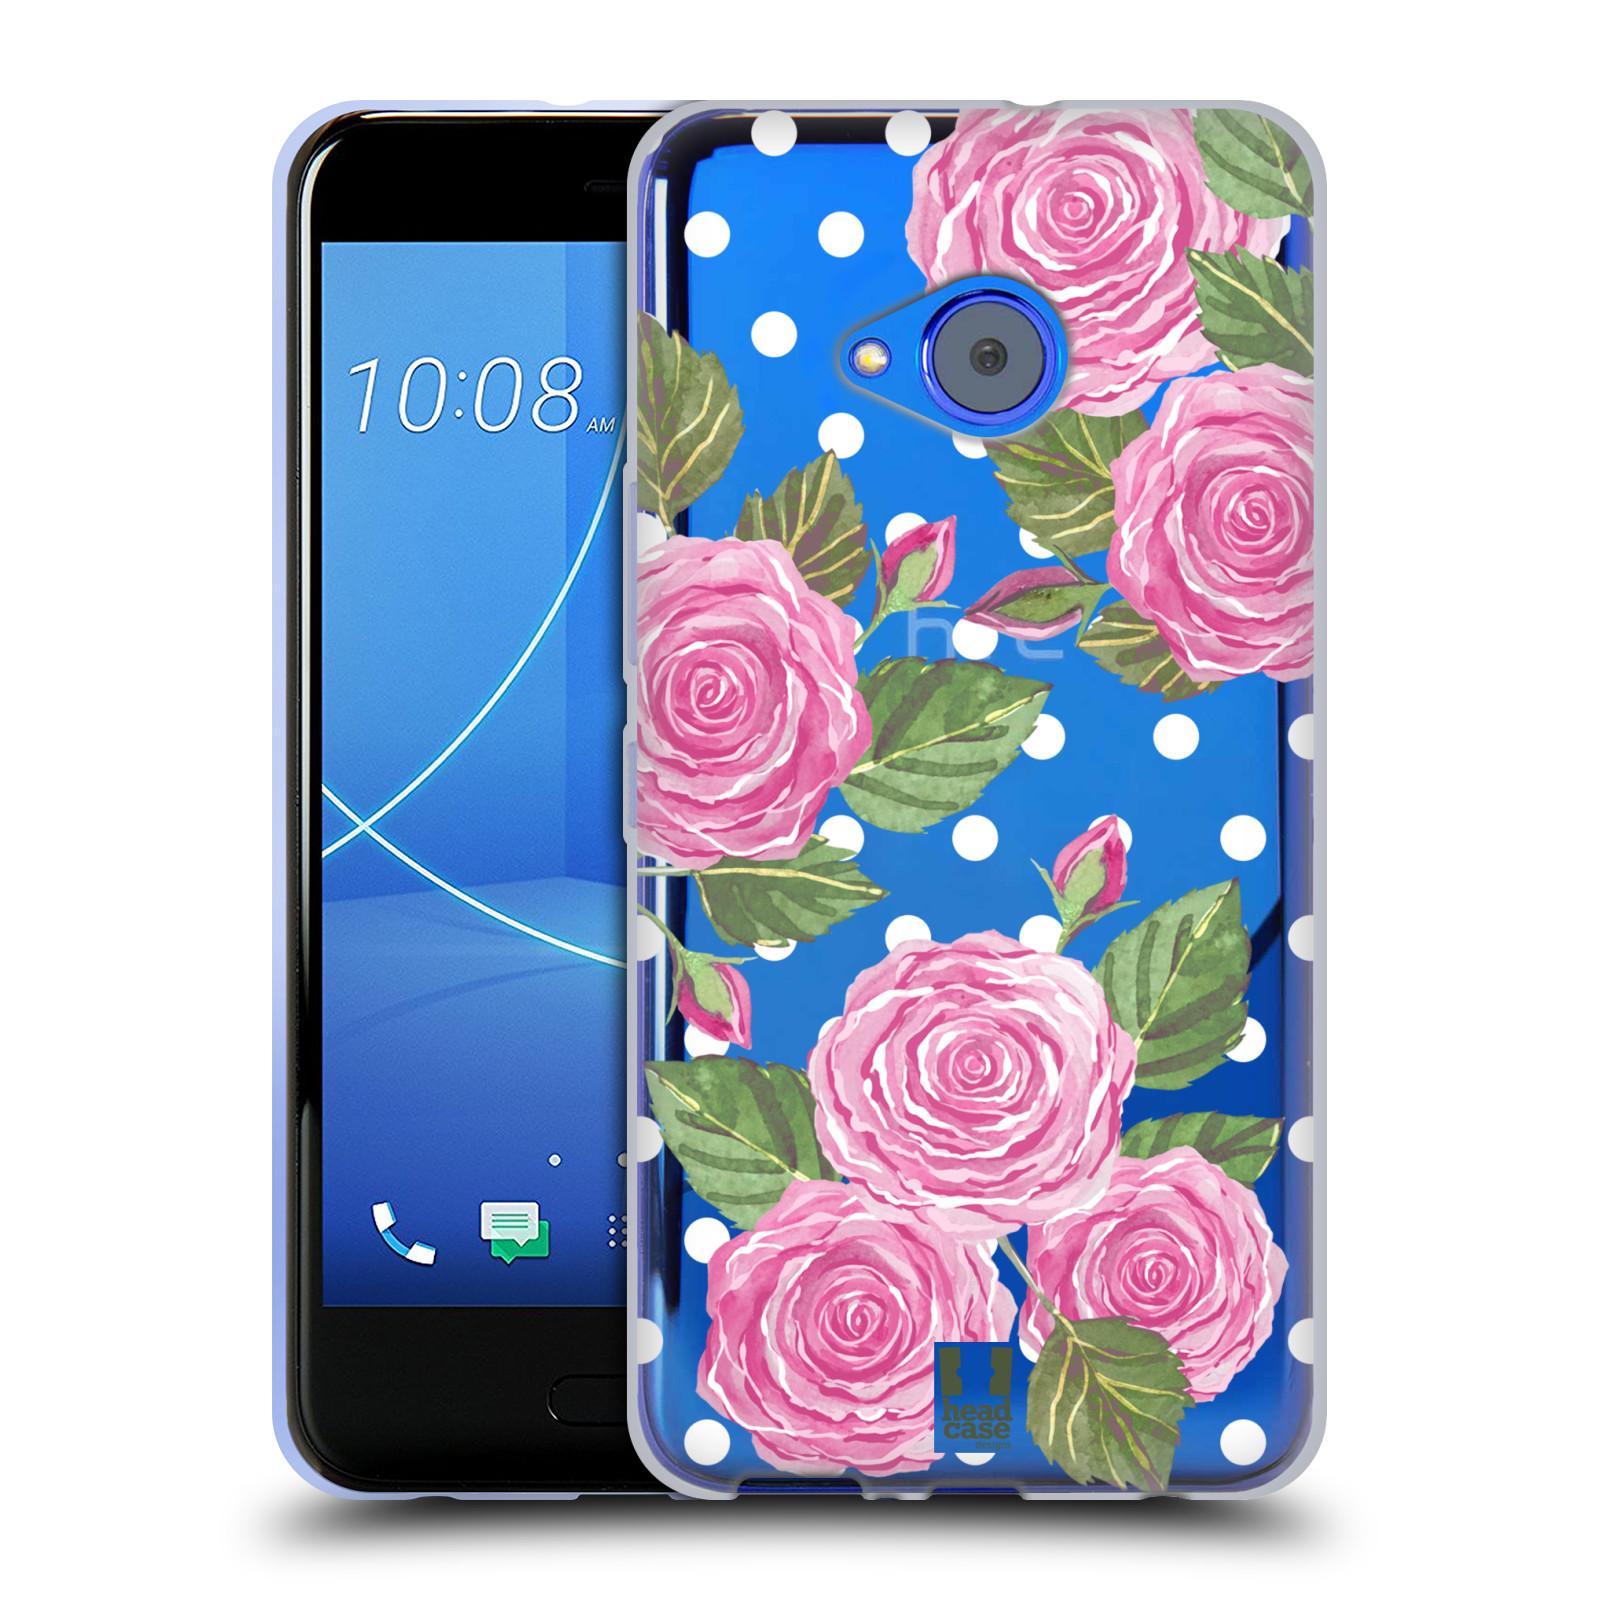 Silikonové pouzdro na mobil HTC U11 Life - Head Case - Hezoučké růžičky - průhledné